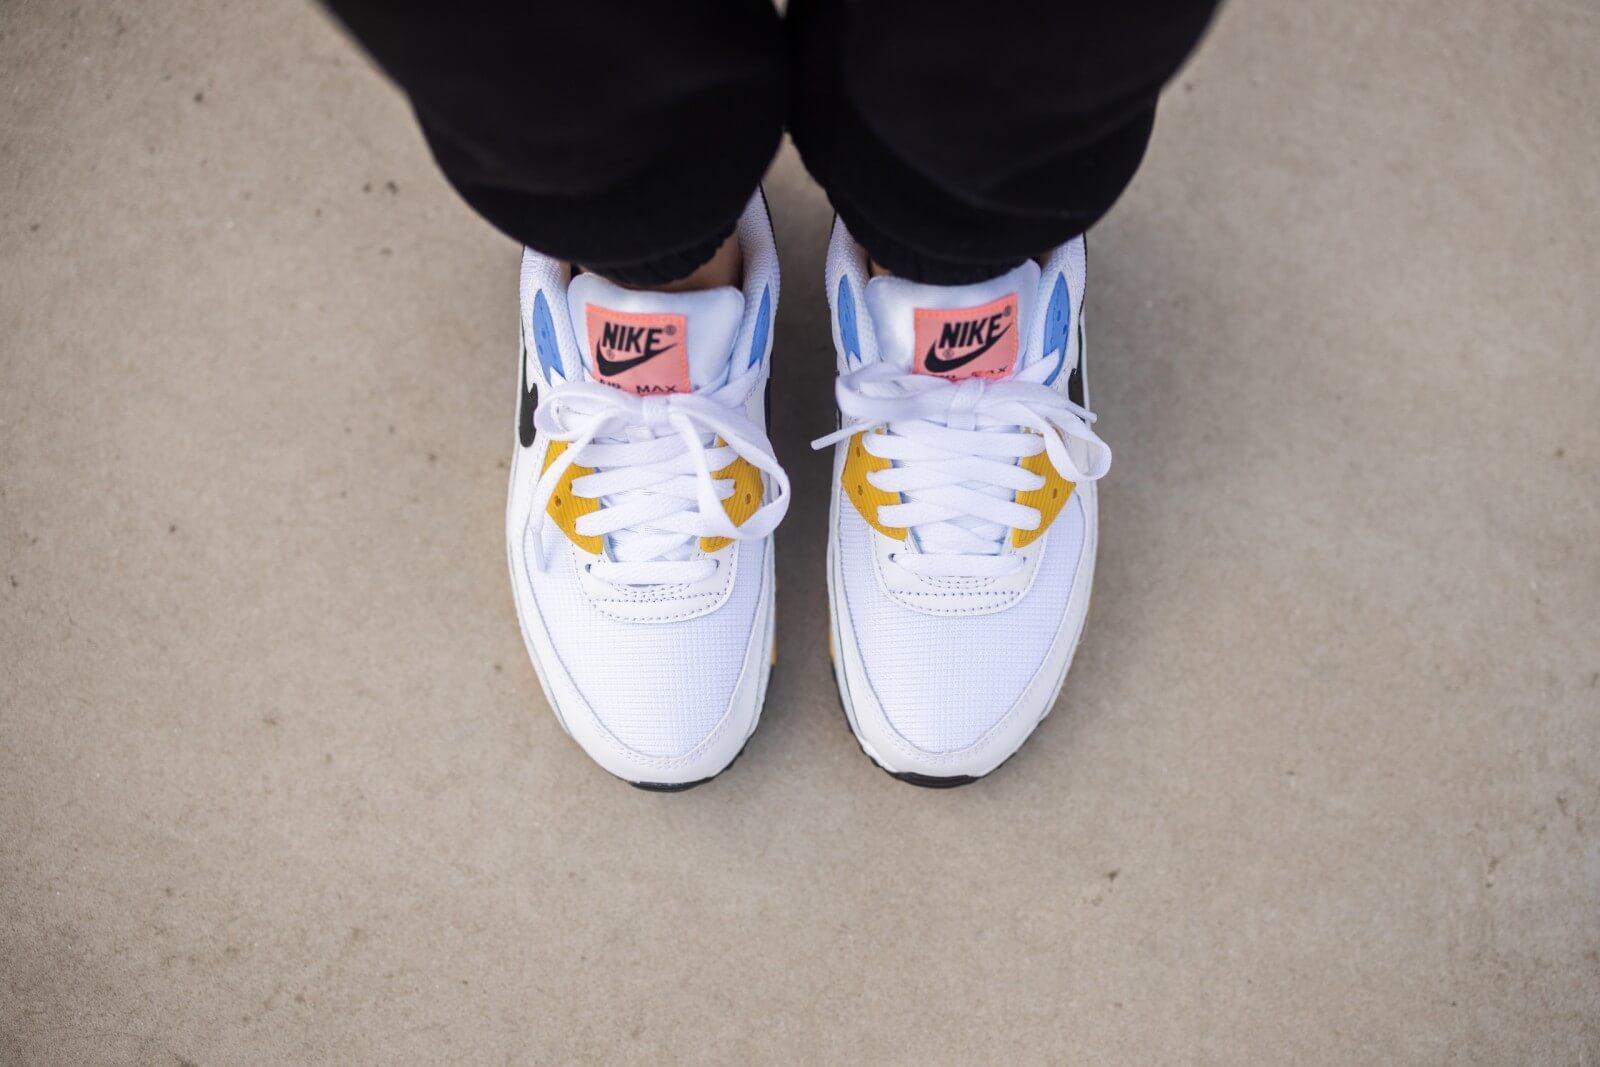 Nike Women's Air Max 90 White/Black-Pure Platinum-Solar Flare